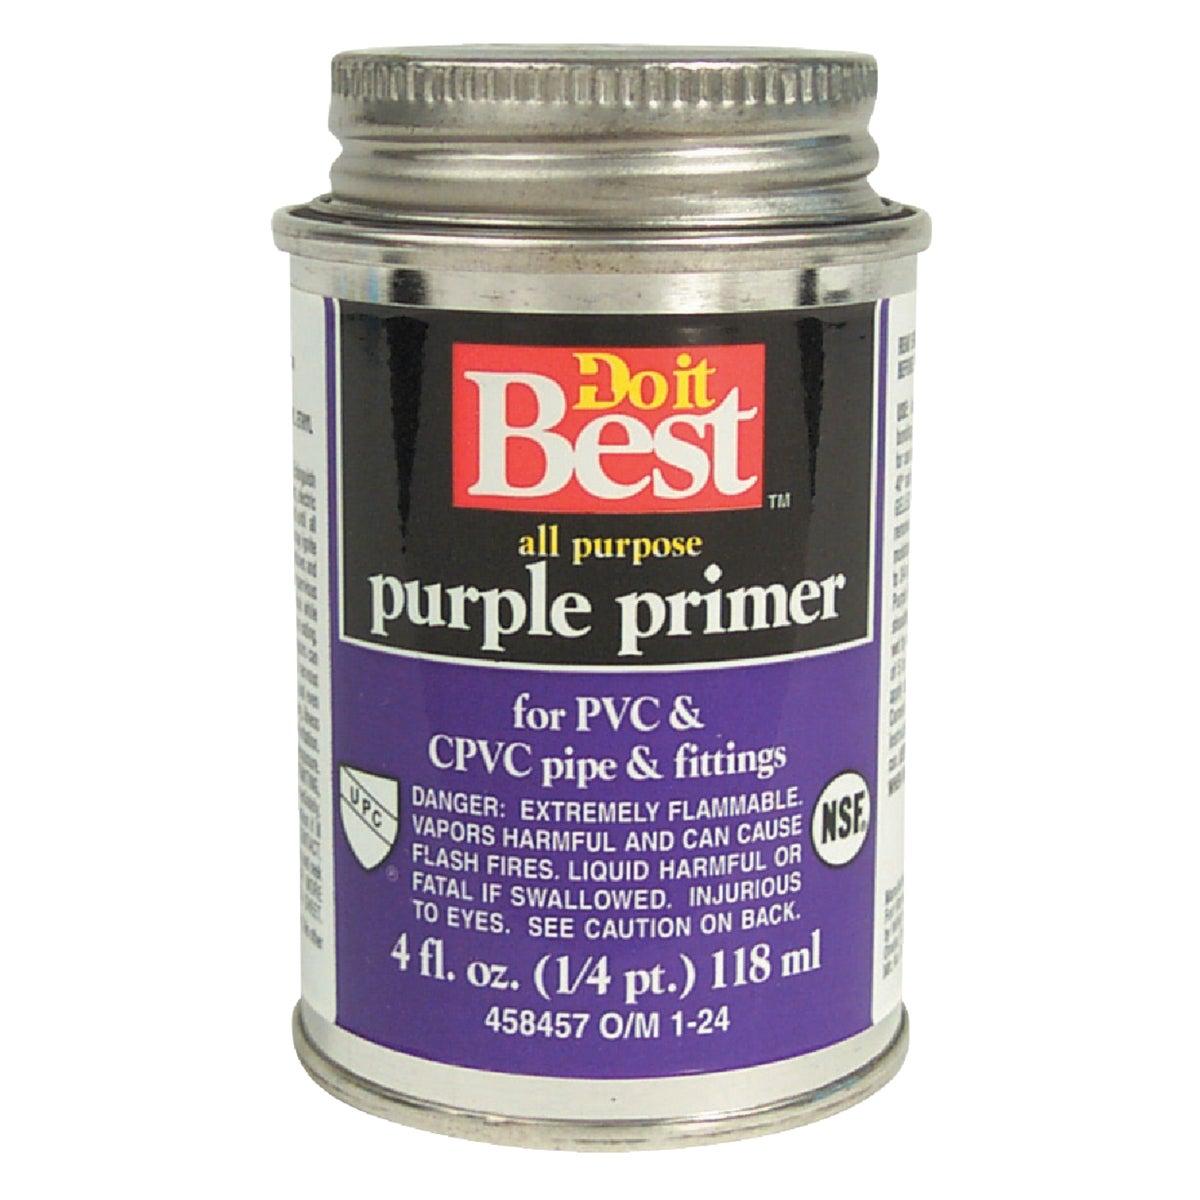 1/4PINT PURPLE PRIMER - 019054 by Wm H Harvey Co